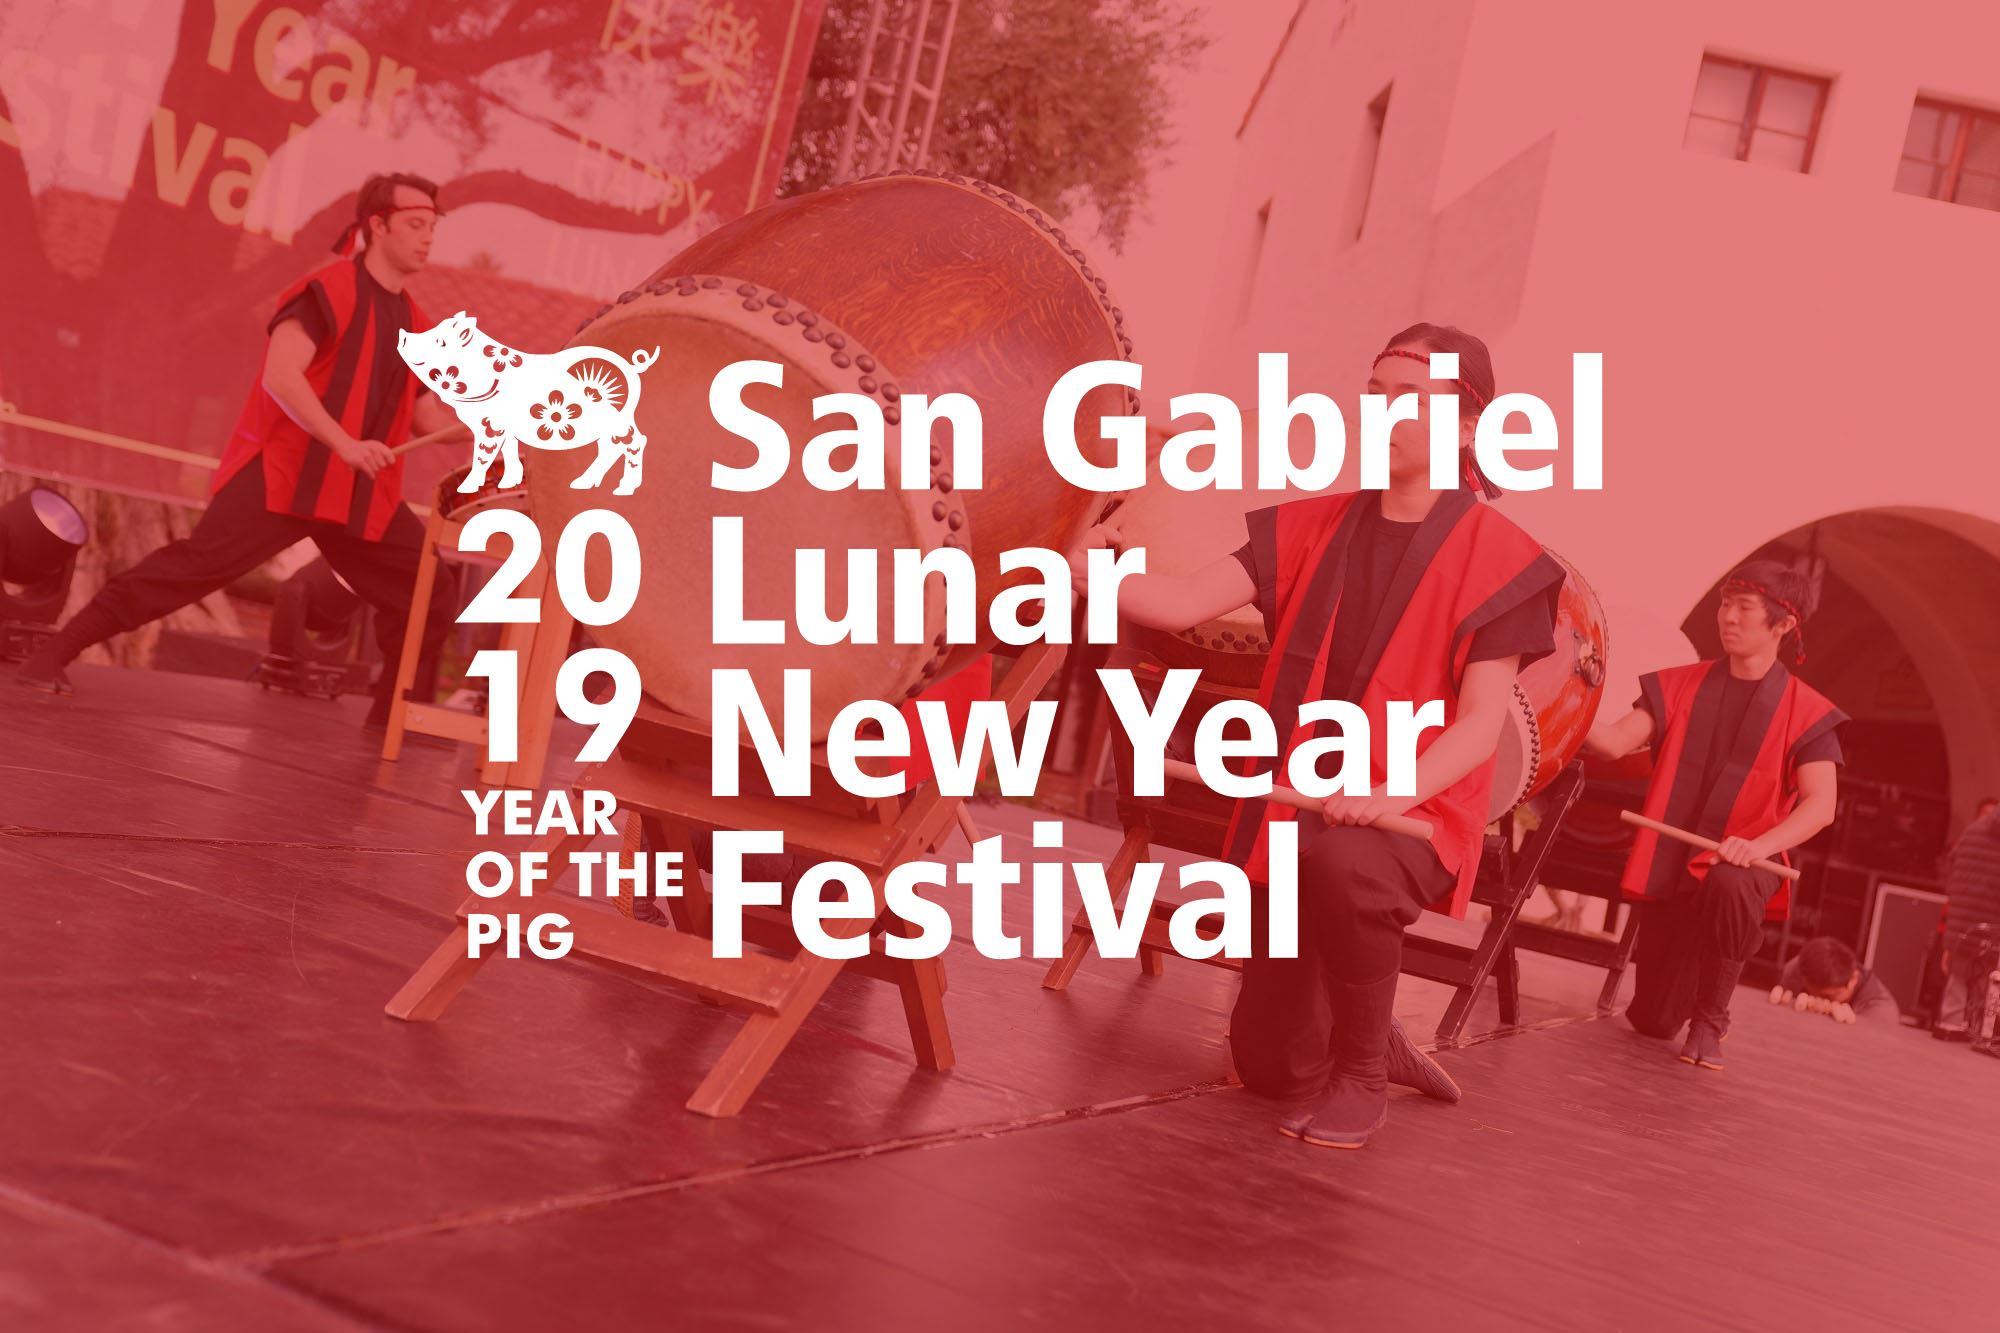 San Gabriel Lunar New Year Festival 2020 San Gabriel, CA   Official Website